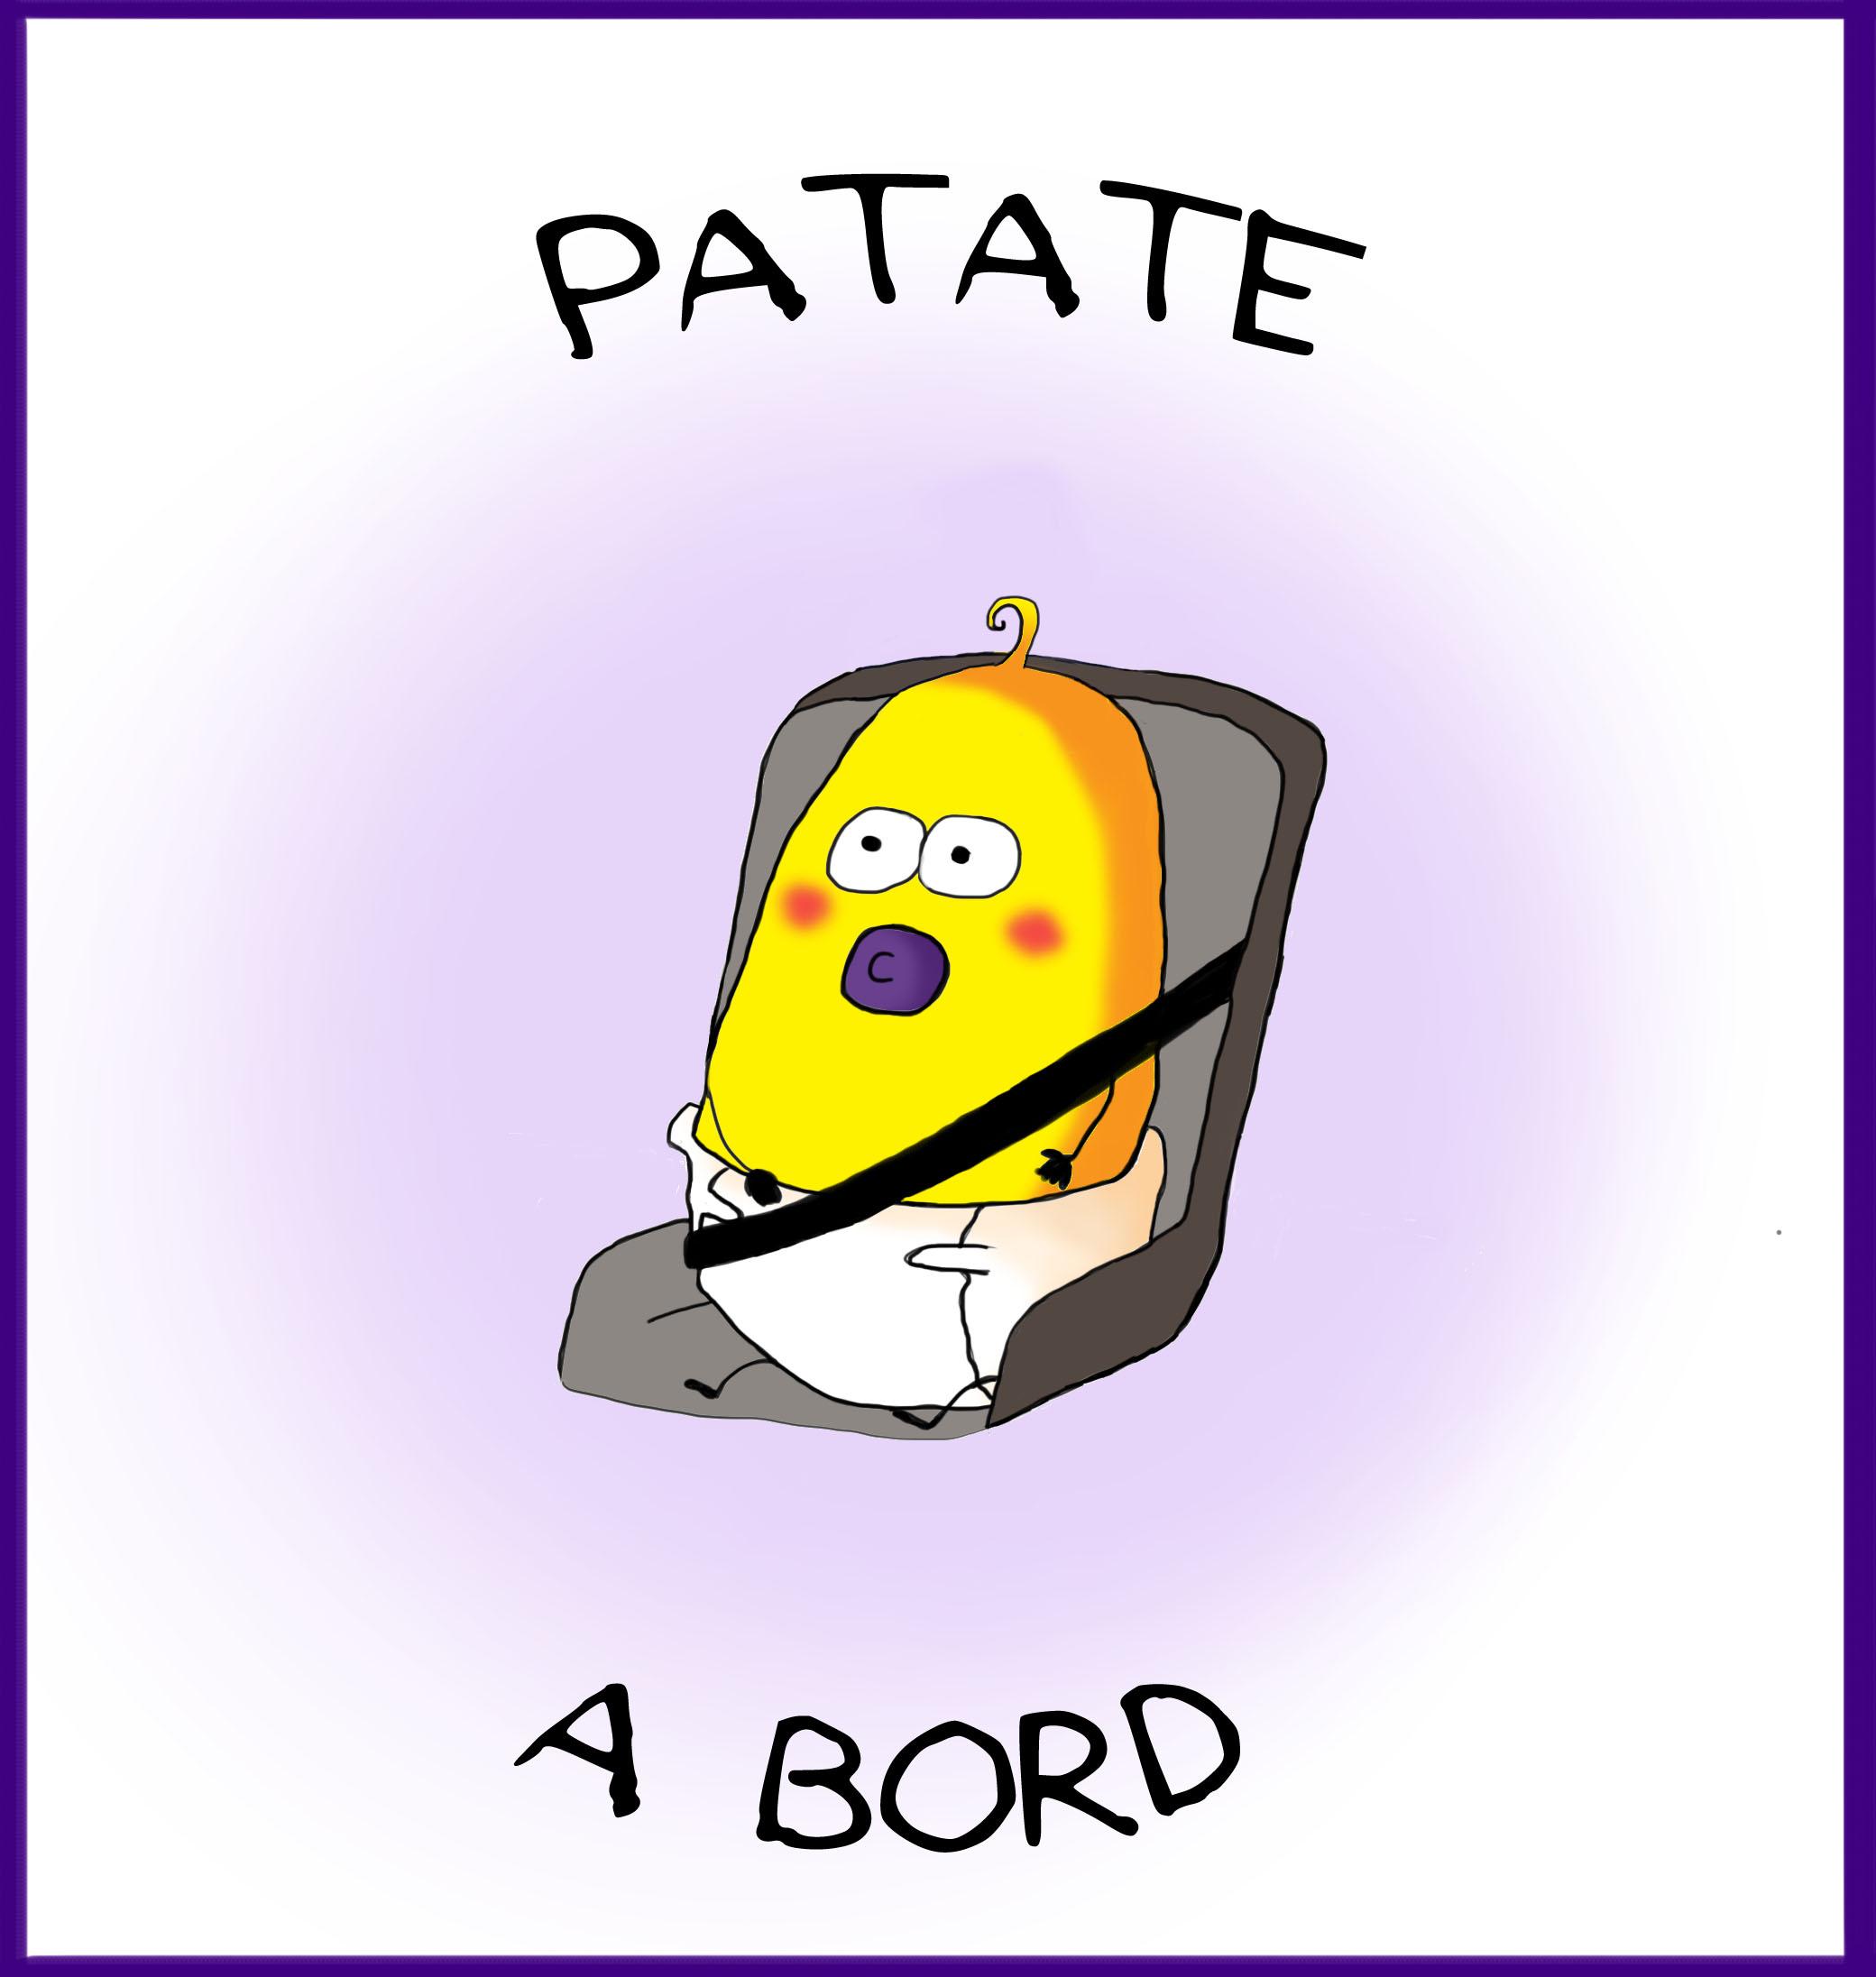 Patatabord